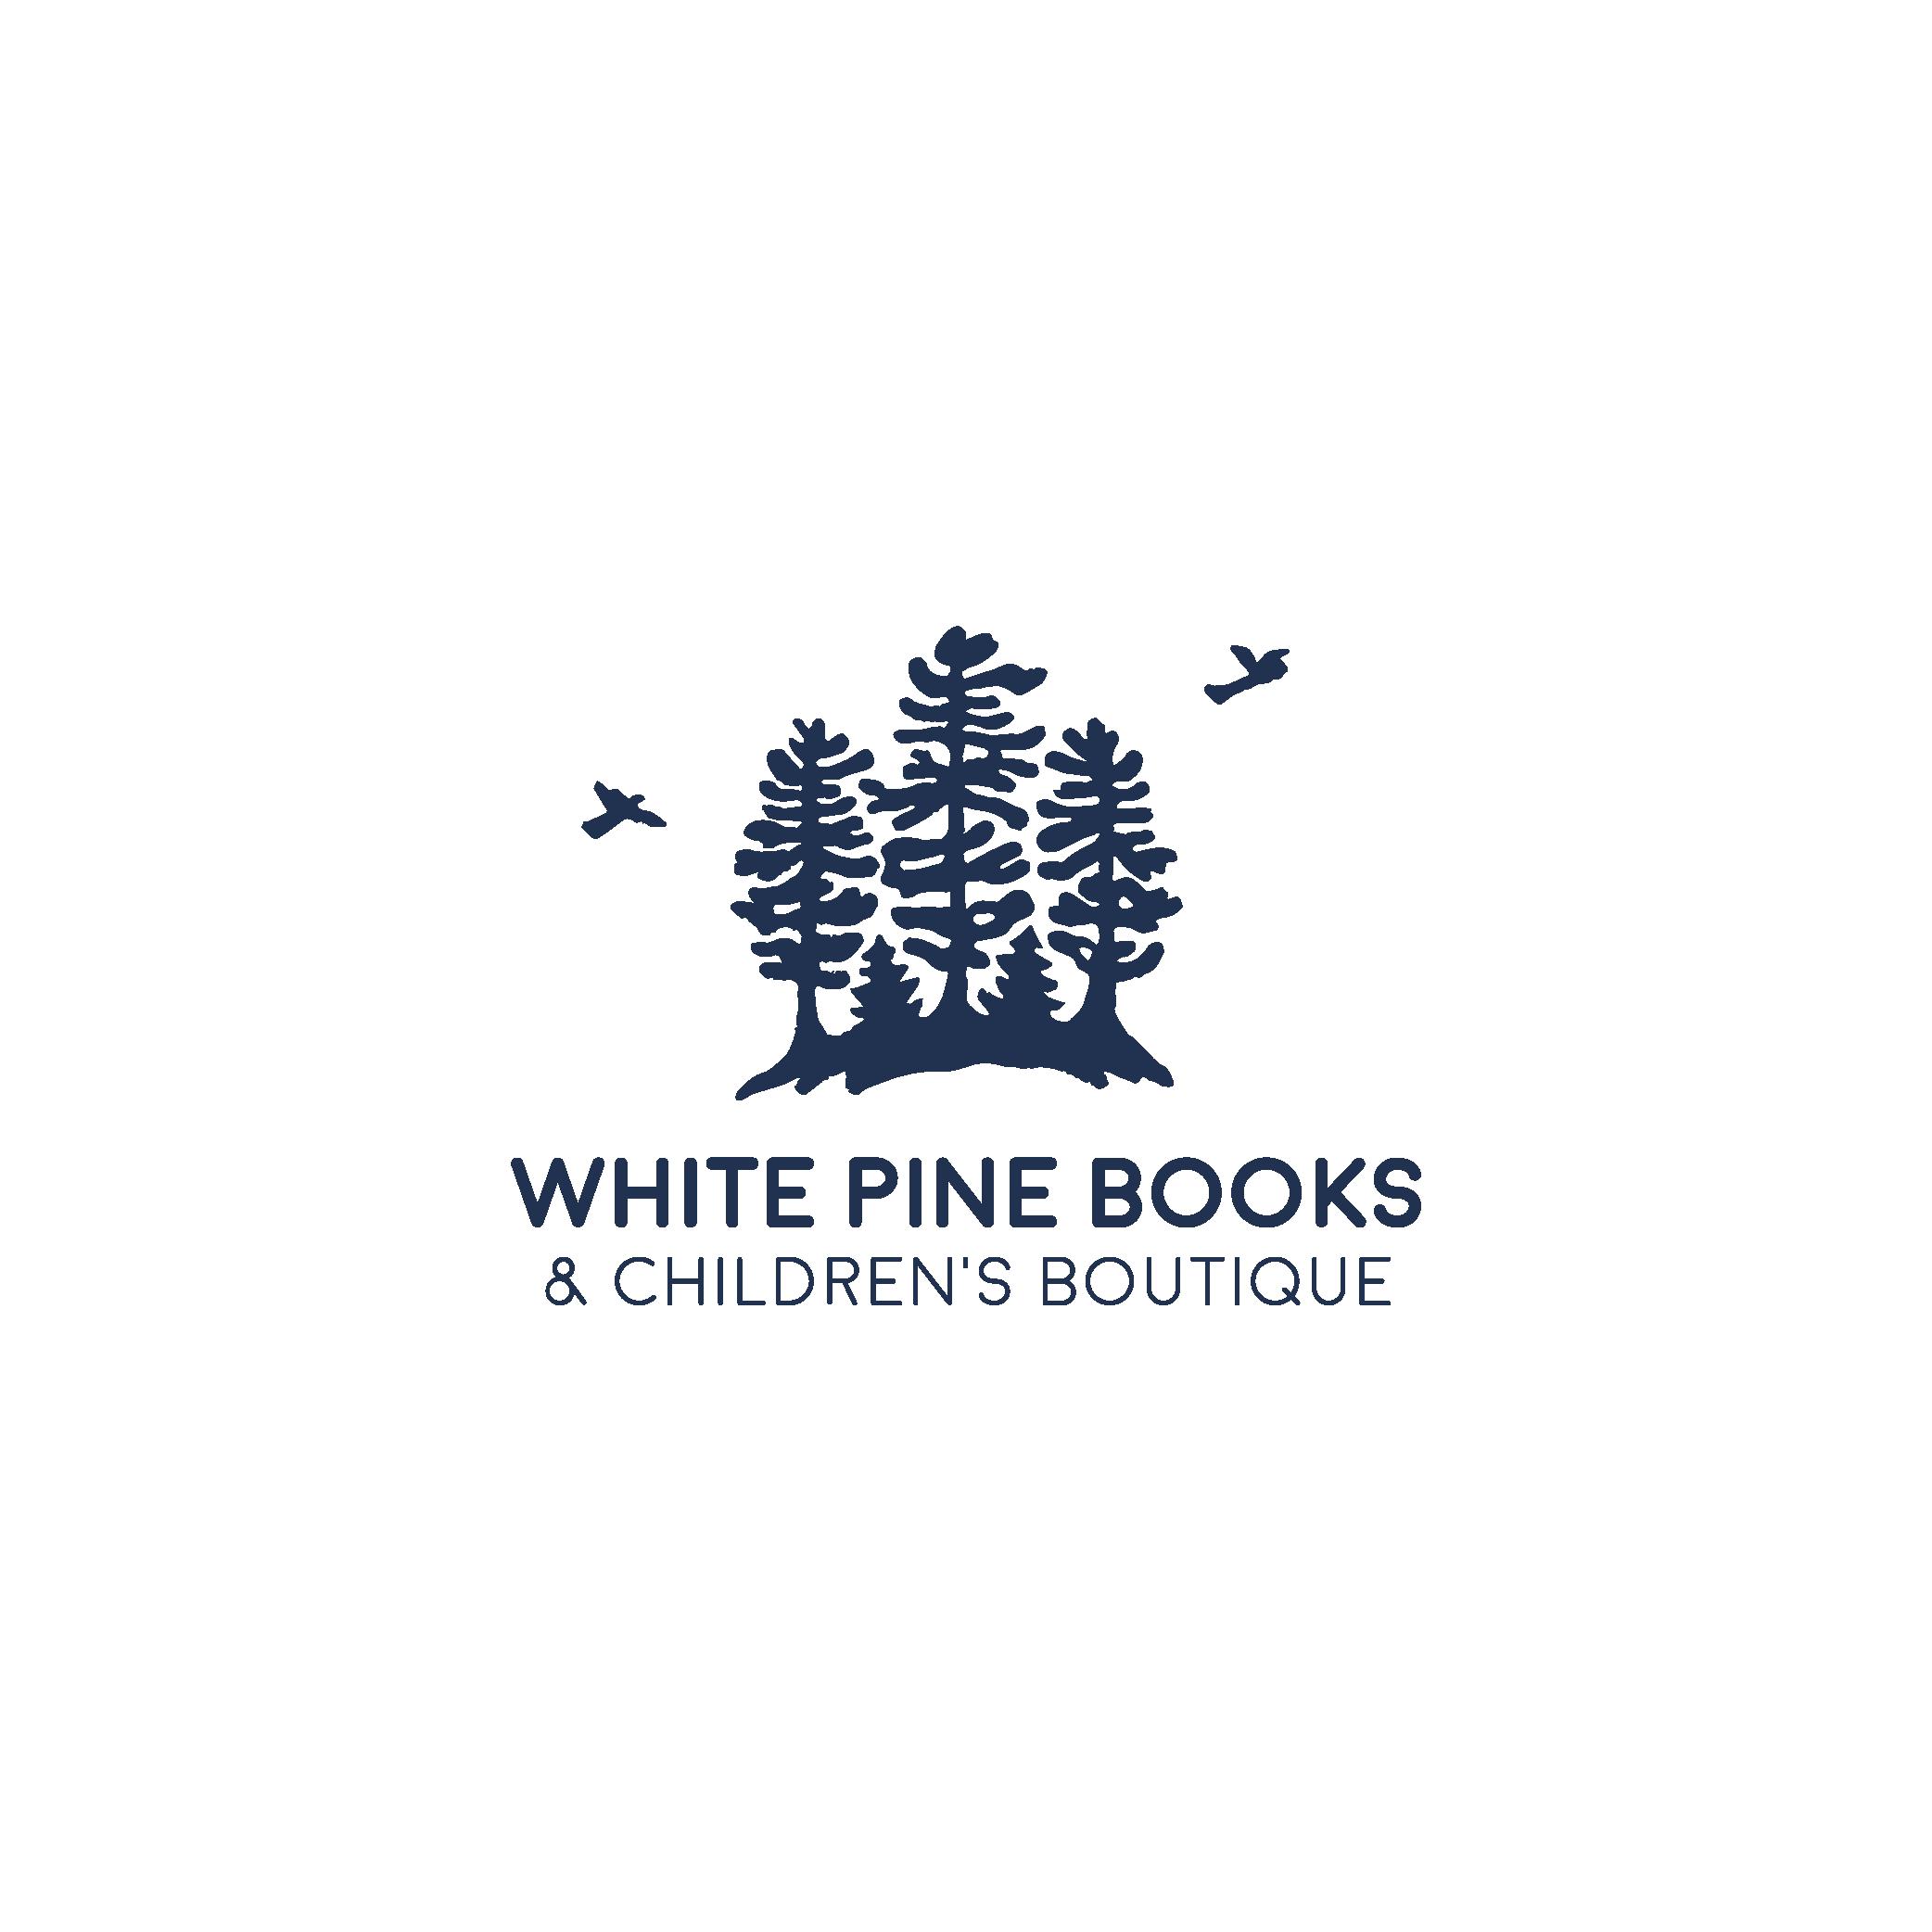 white pine books logo design